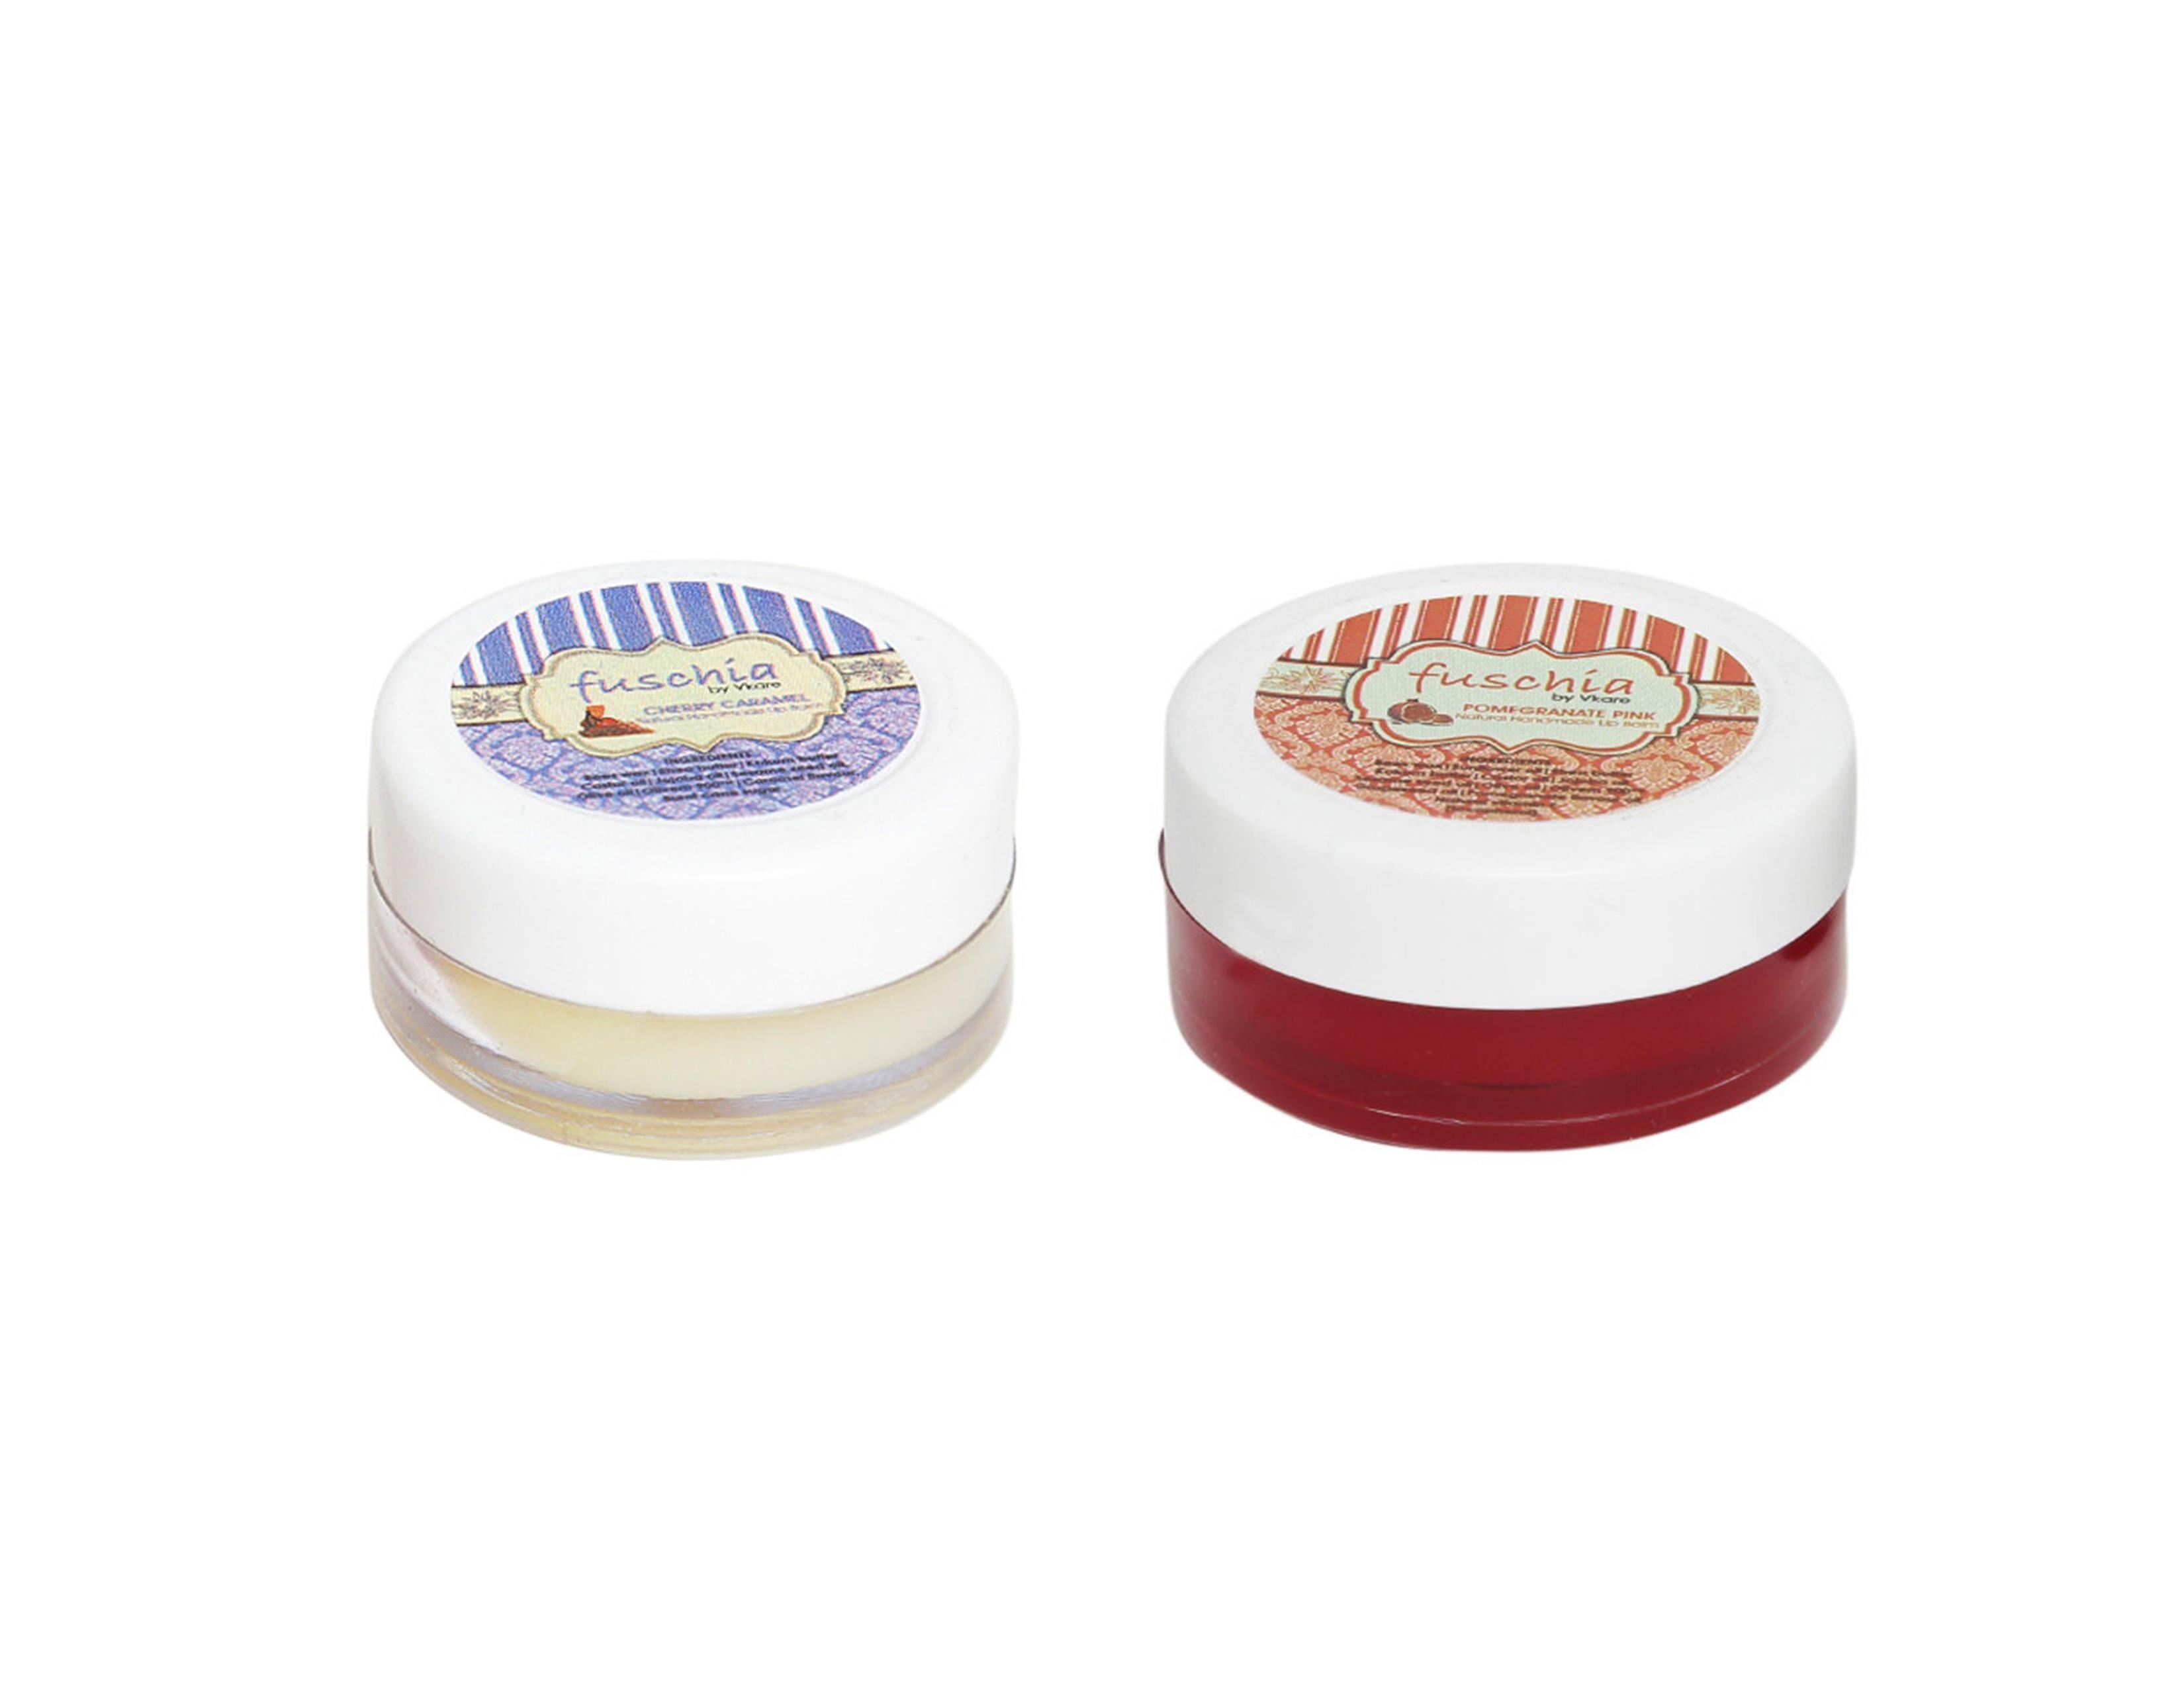 Fuschia – Caramel & Pomegranate Lip Balm Combo 16gm